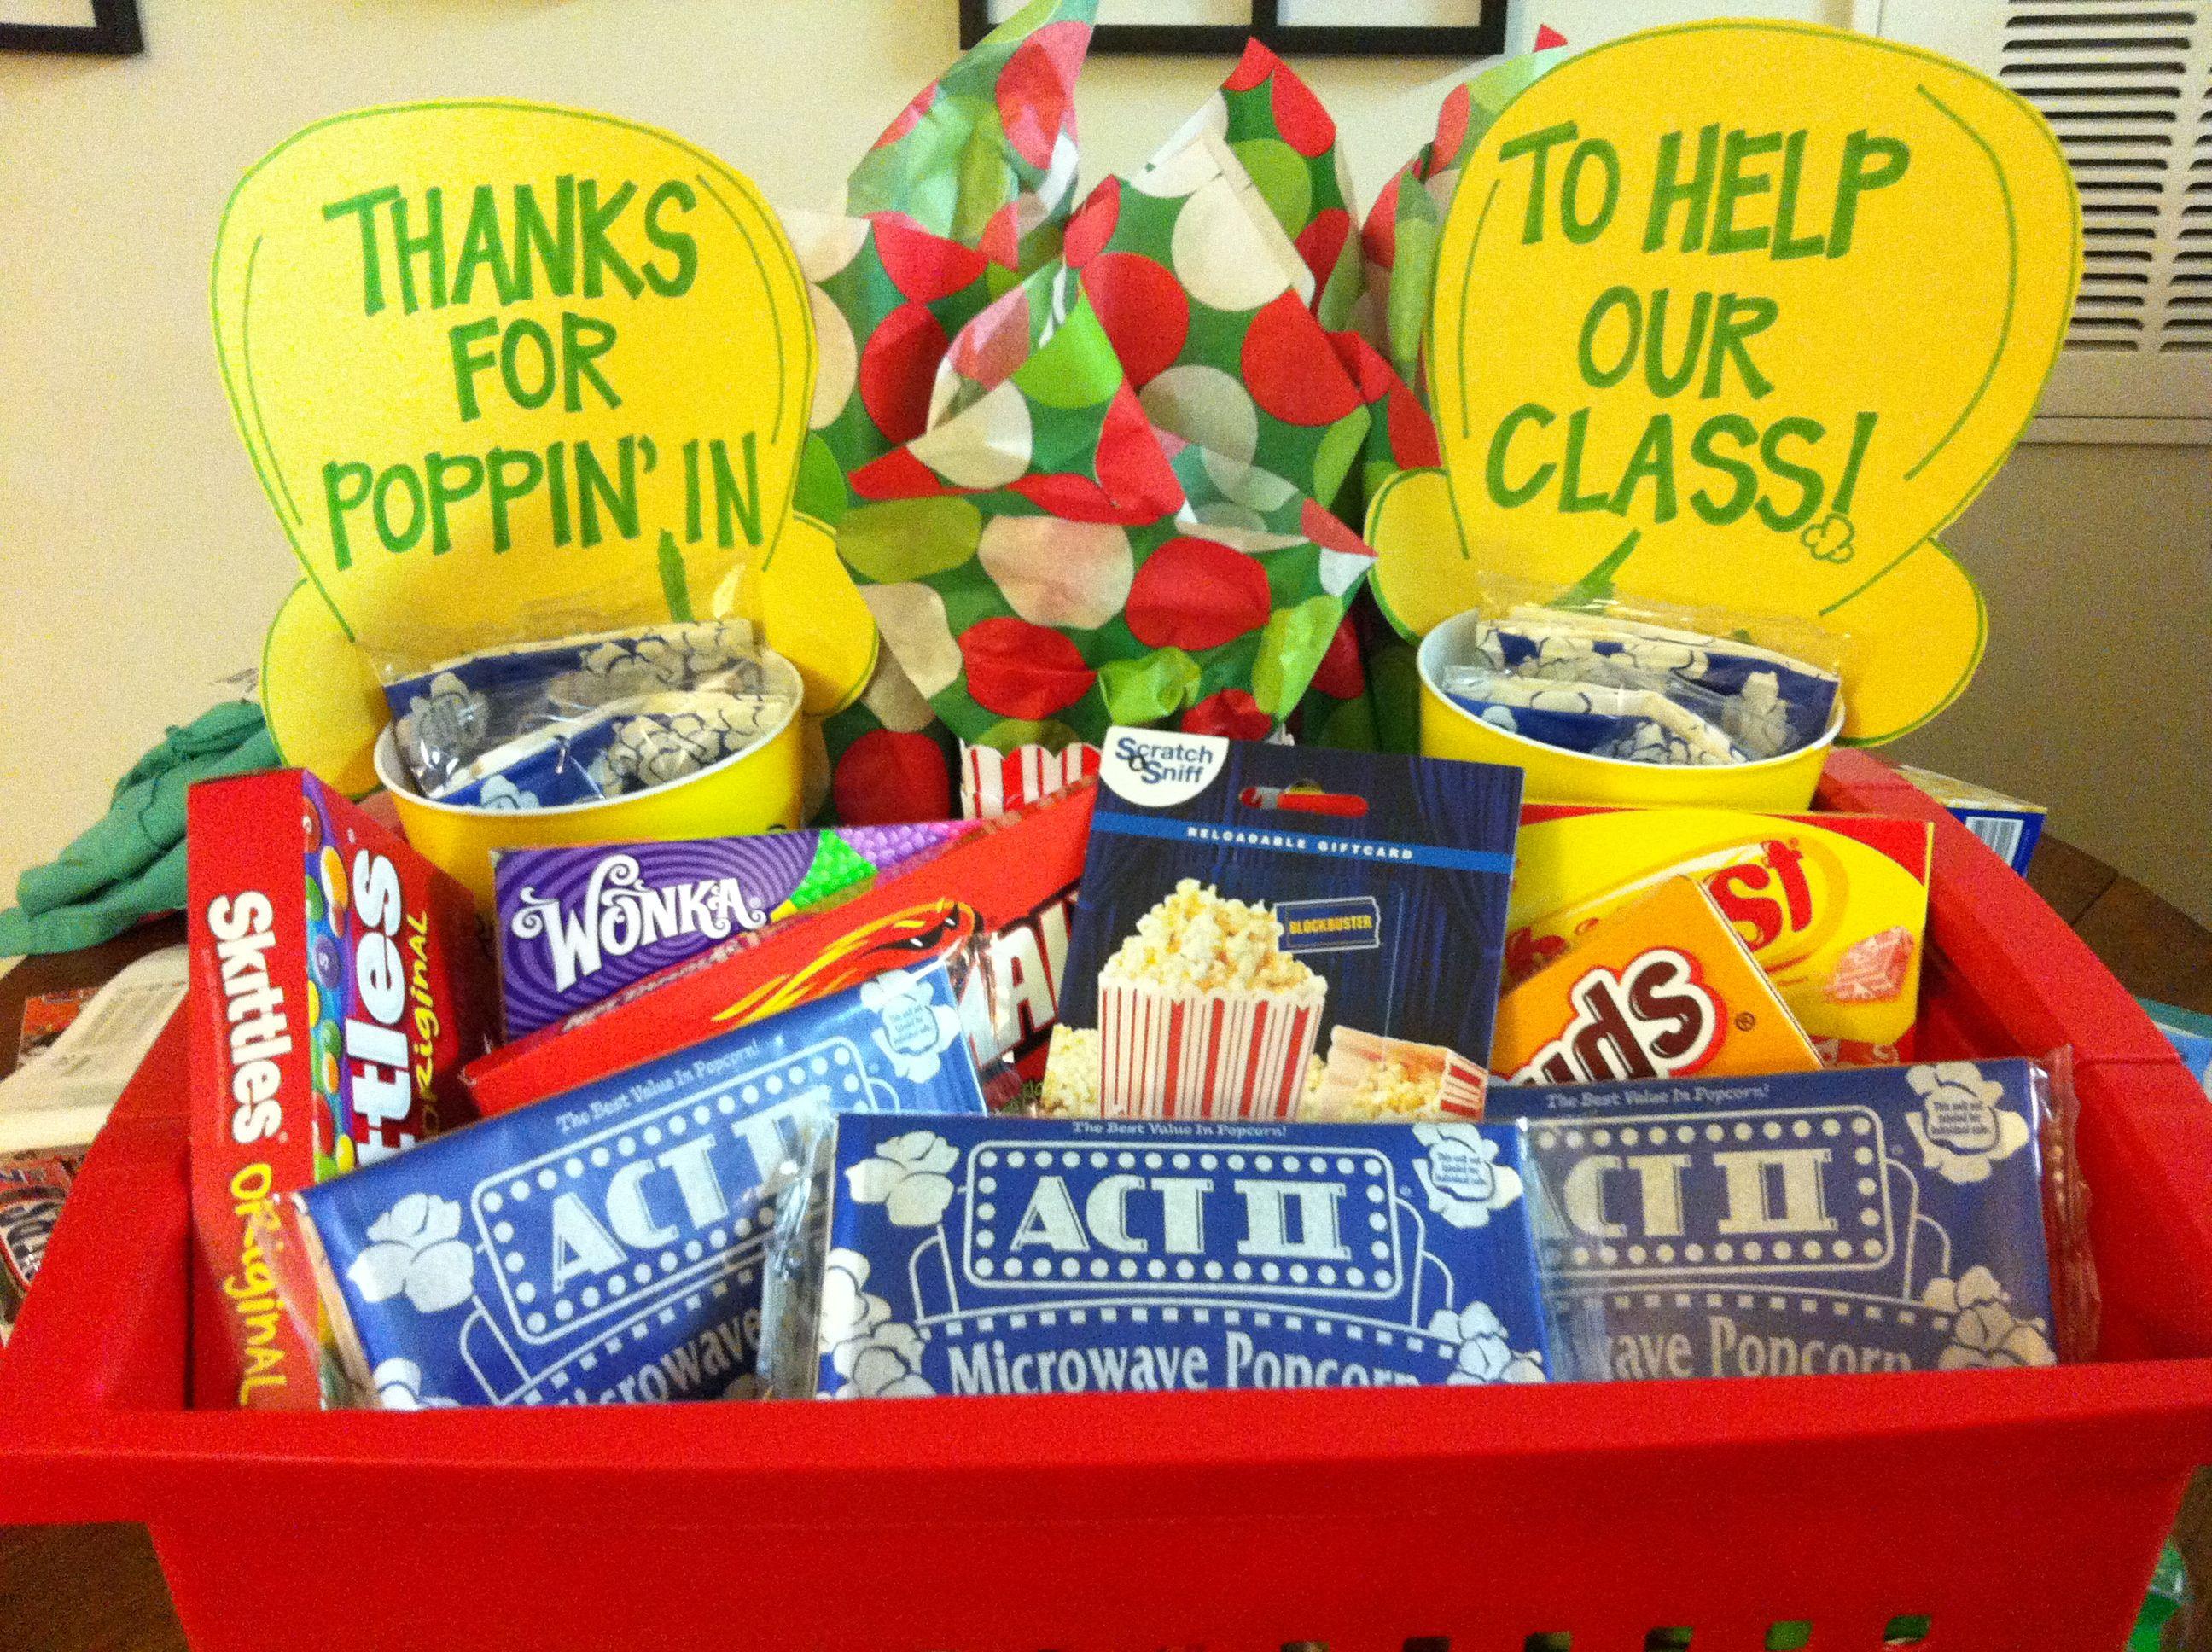 Pin By Laryn Garrett On School Stuff Room Mom Gifts Classroom Gifts Room Parent Gifts